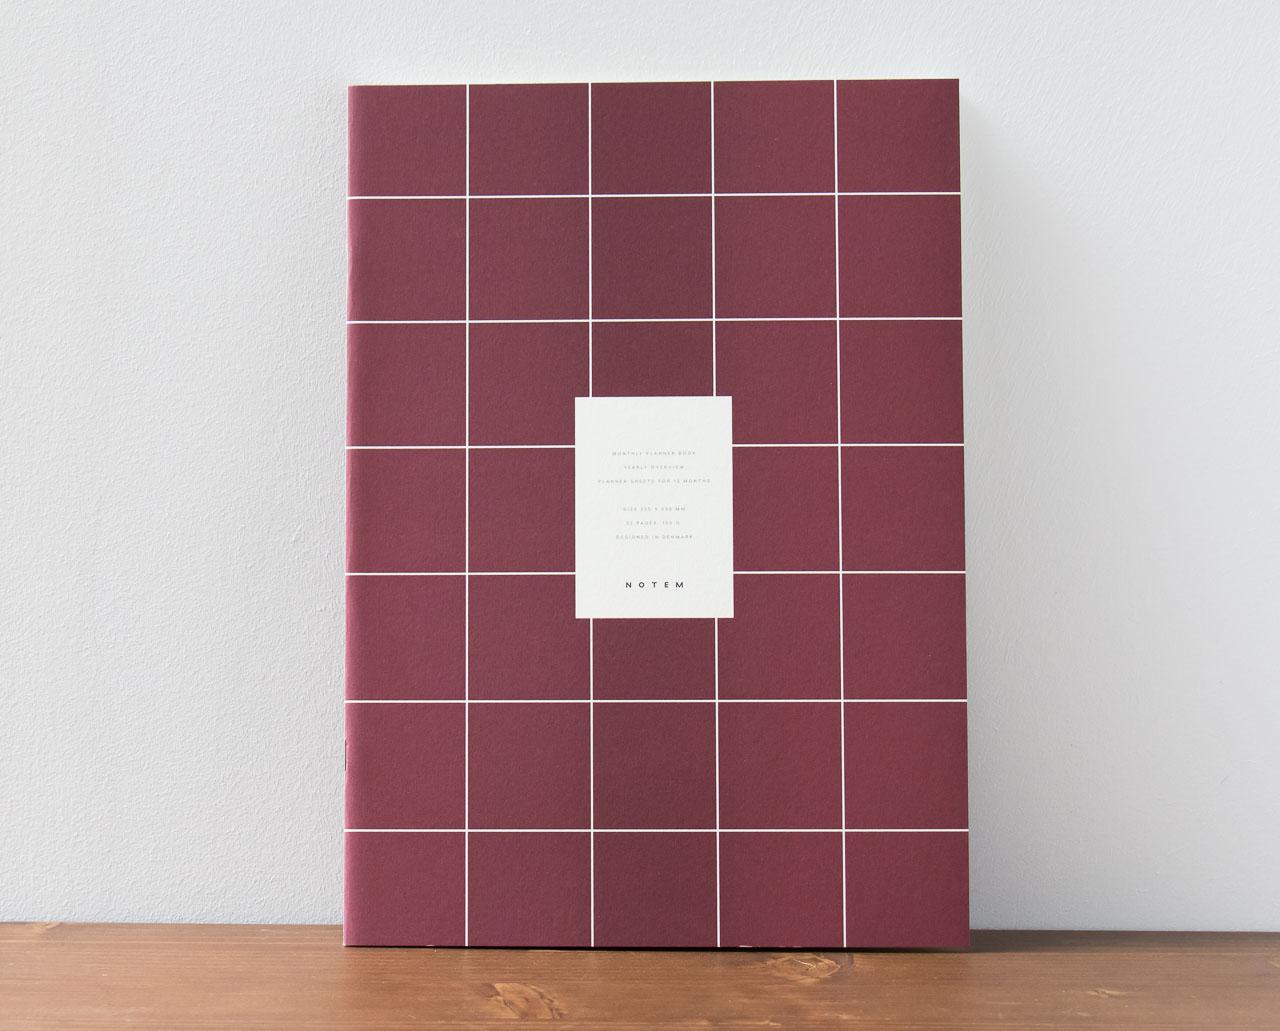 Cahier mensuel Milo Notem studio - Maison Mathûvû